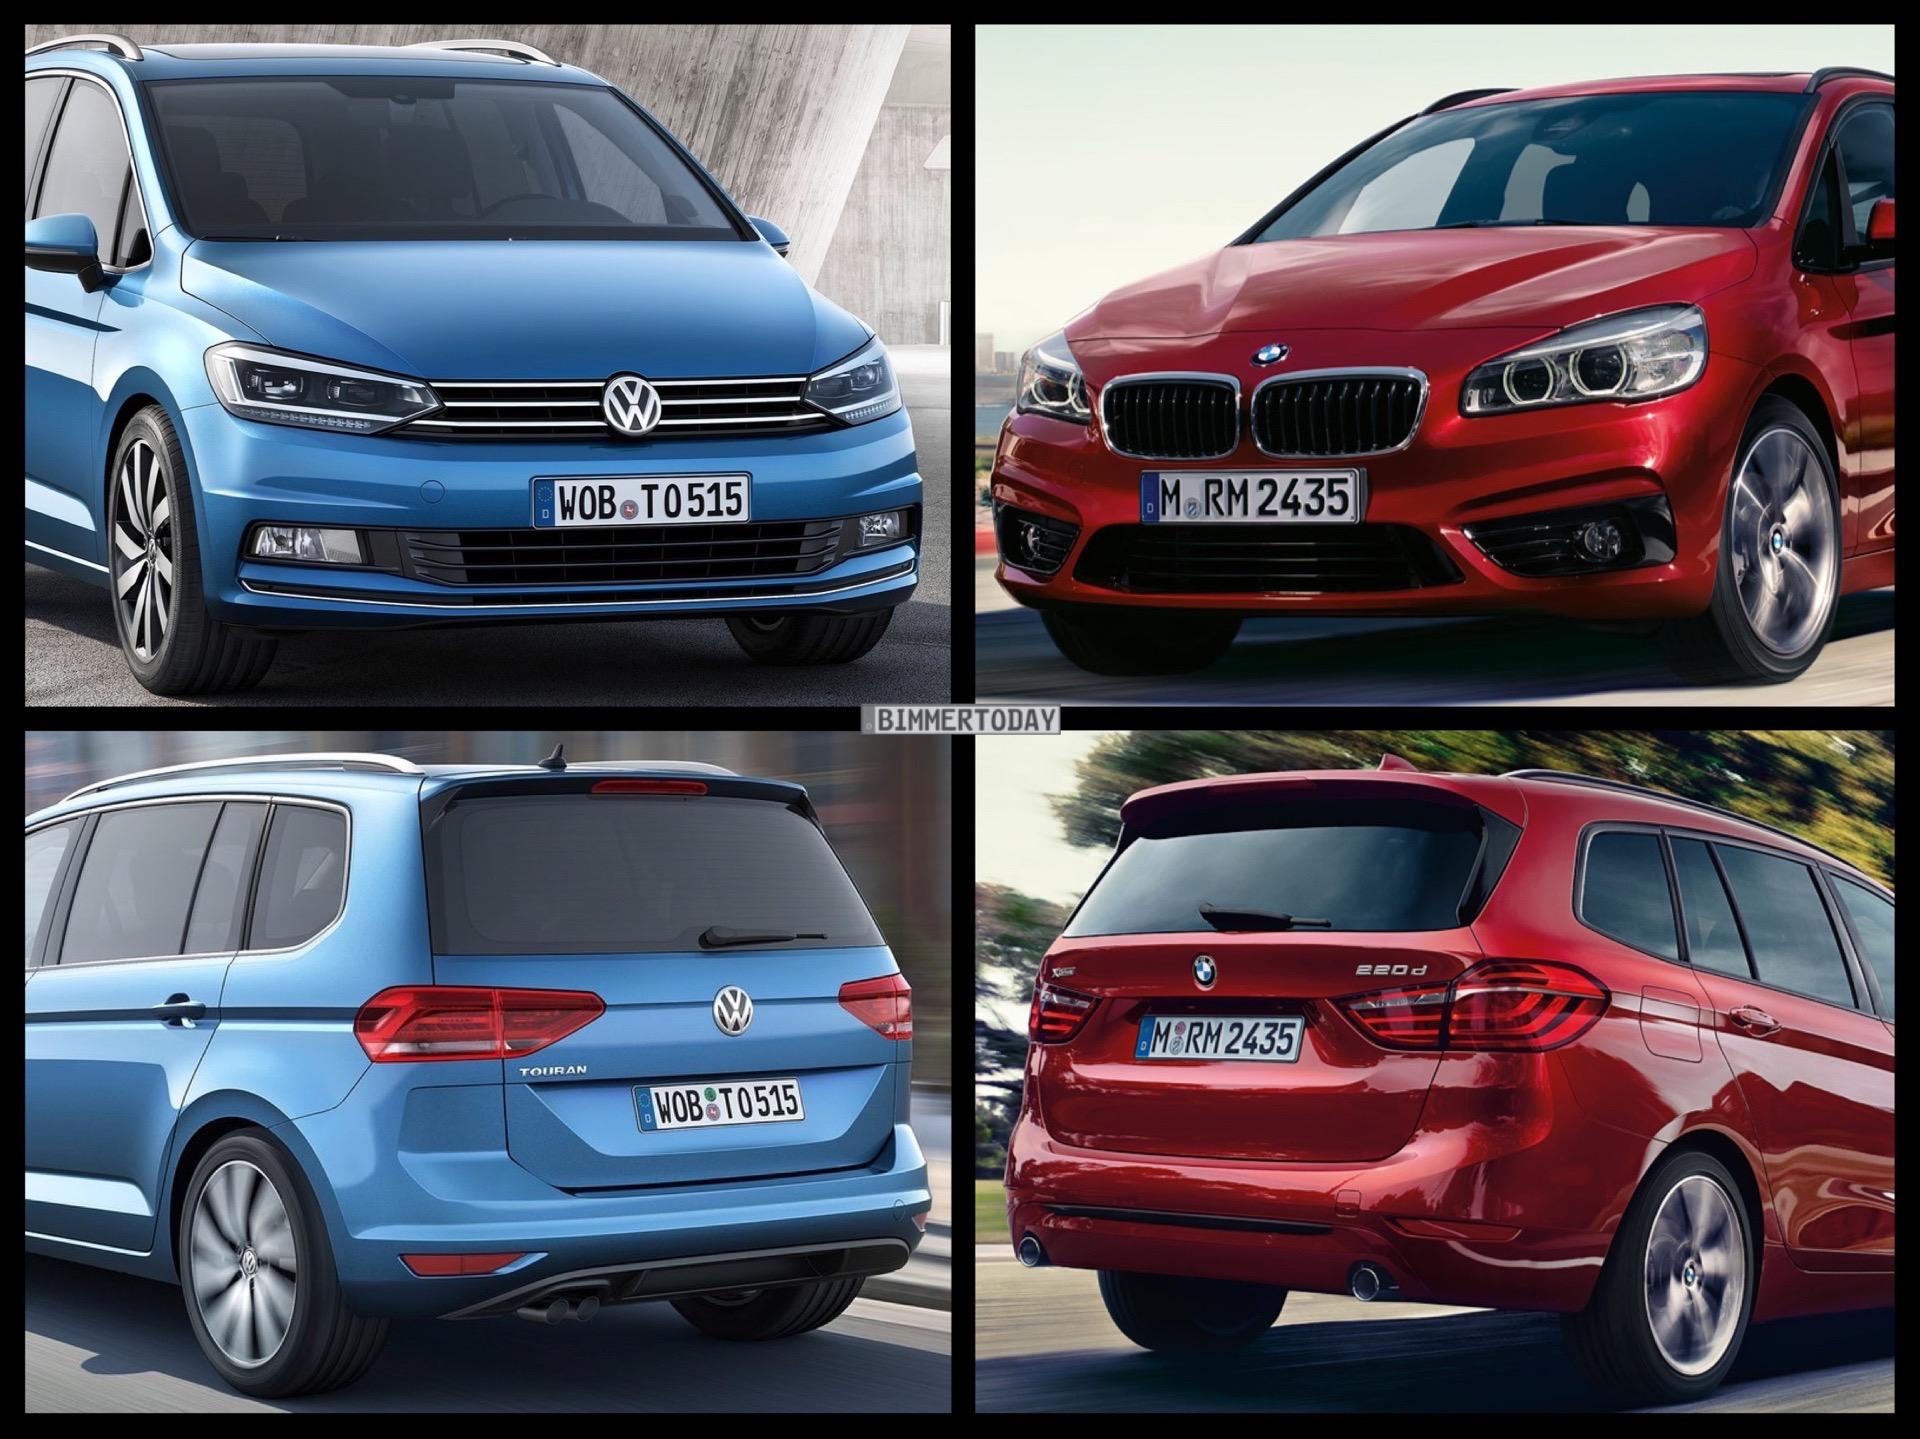 Photo Comparison: Volkswagen Touran vs. BMW 2 Series Gran Tourer